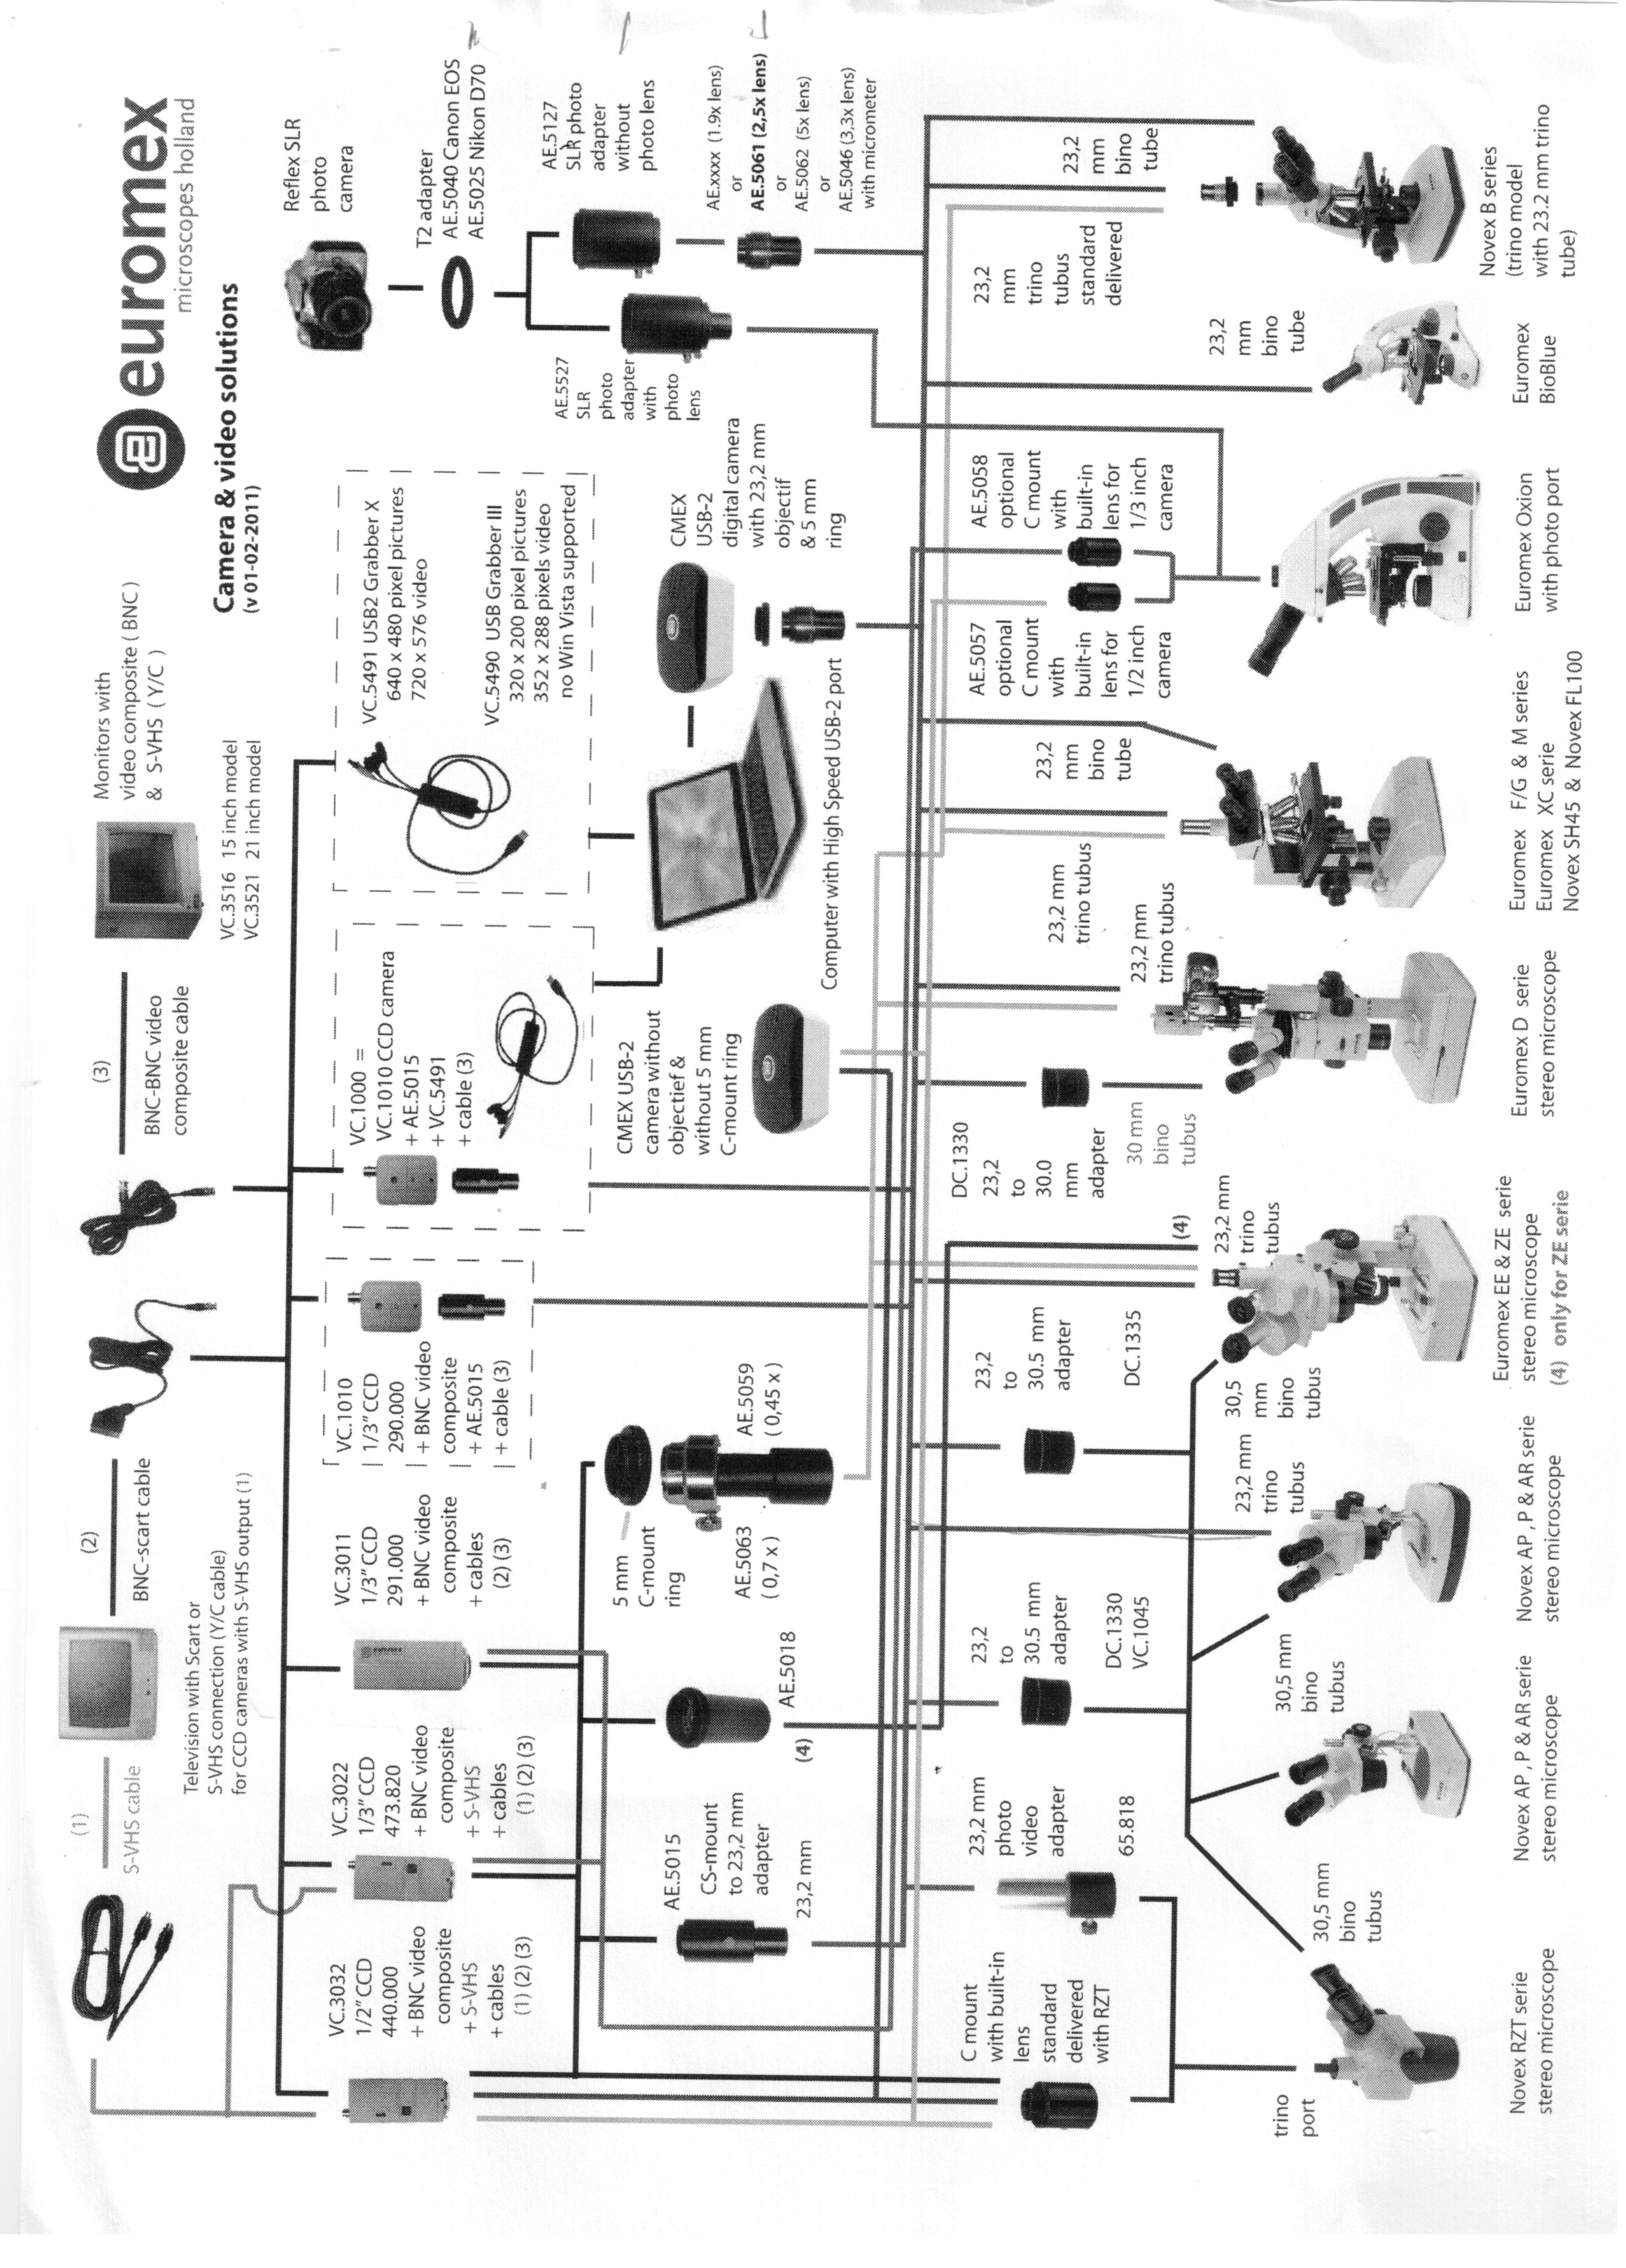 connection cameras